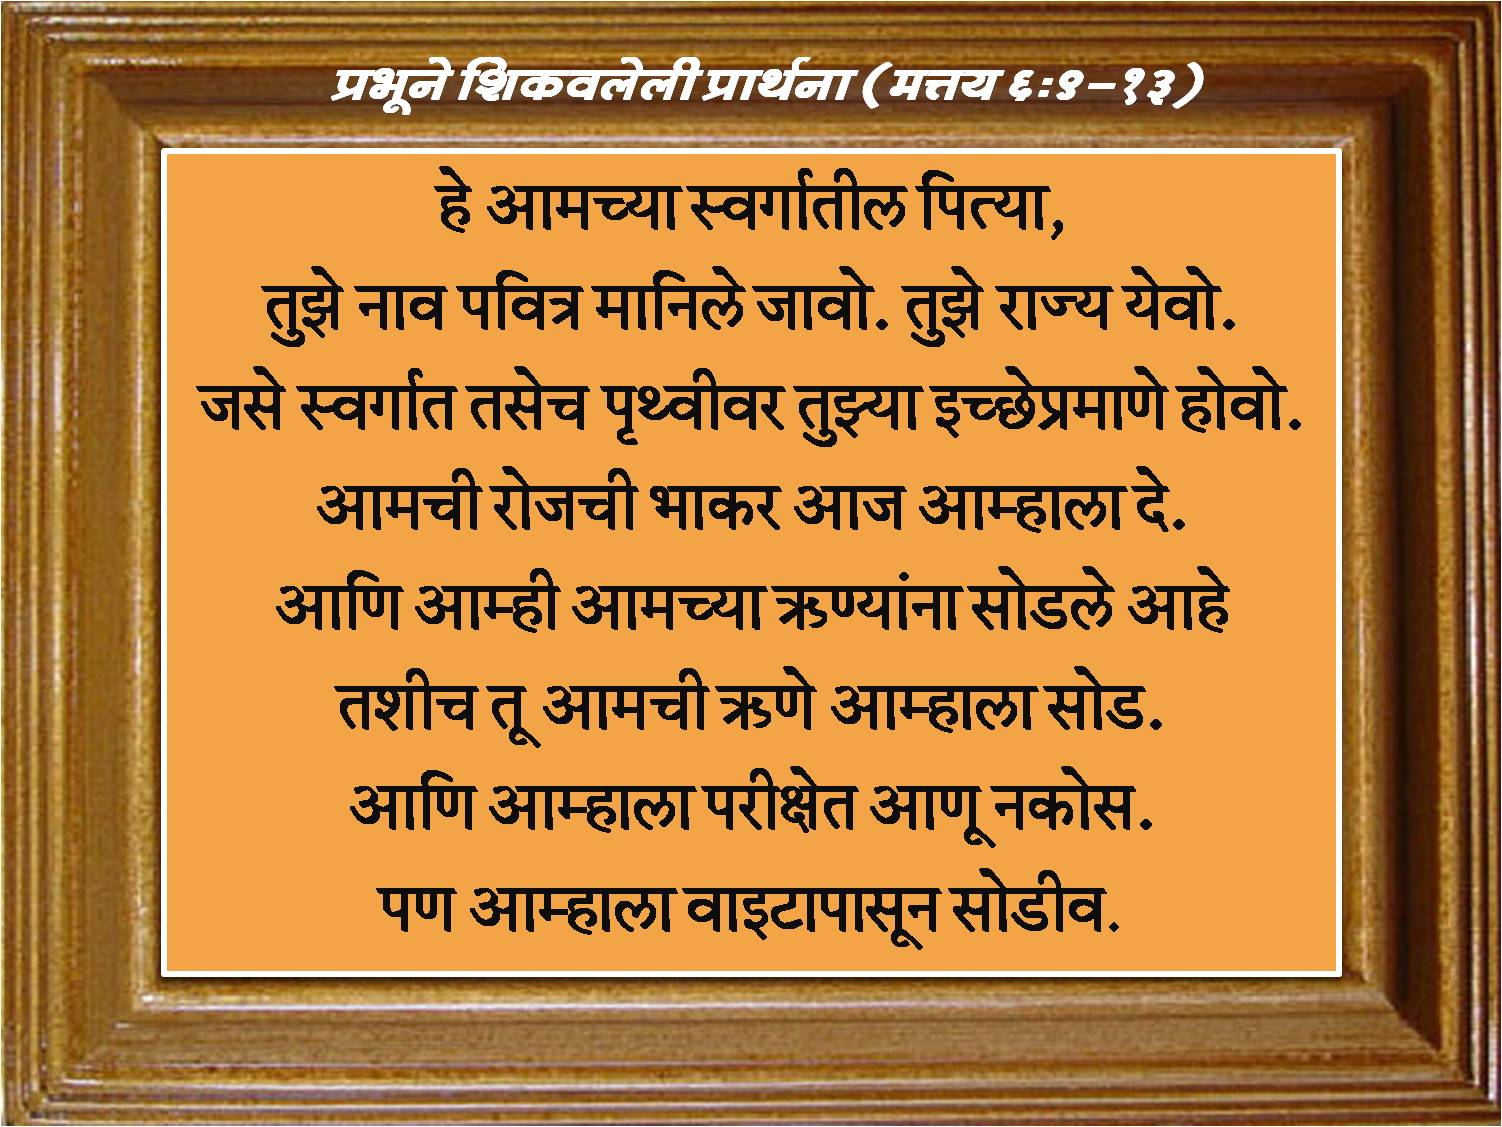 marathi bible wallpaper for - photo #33